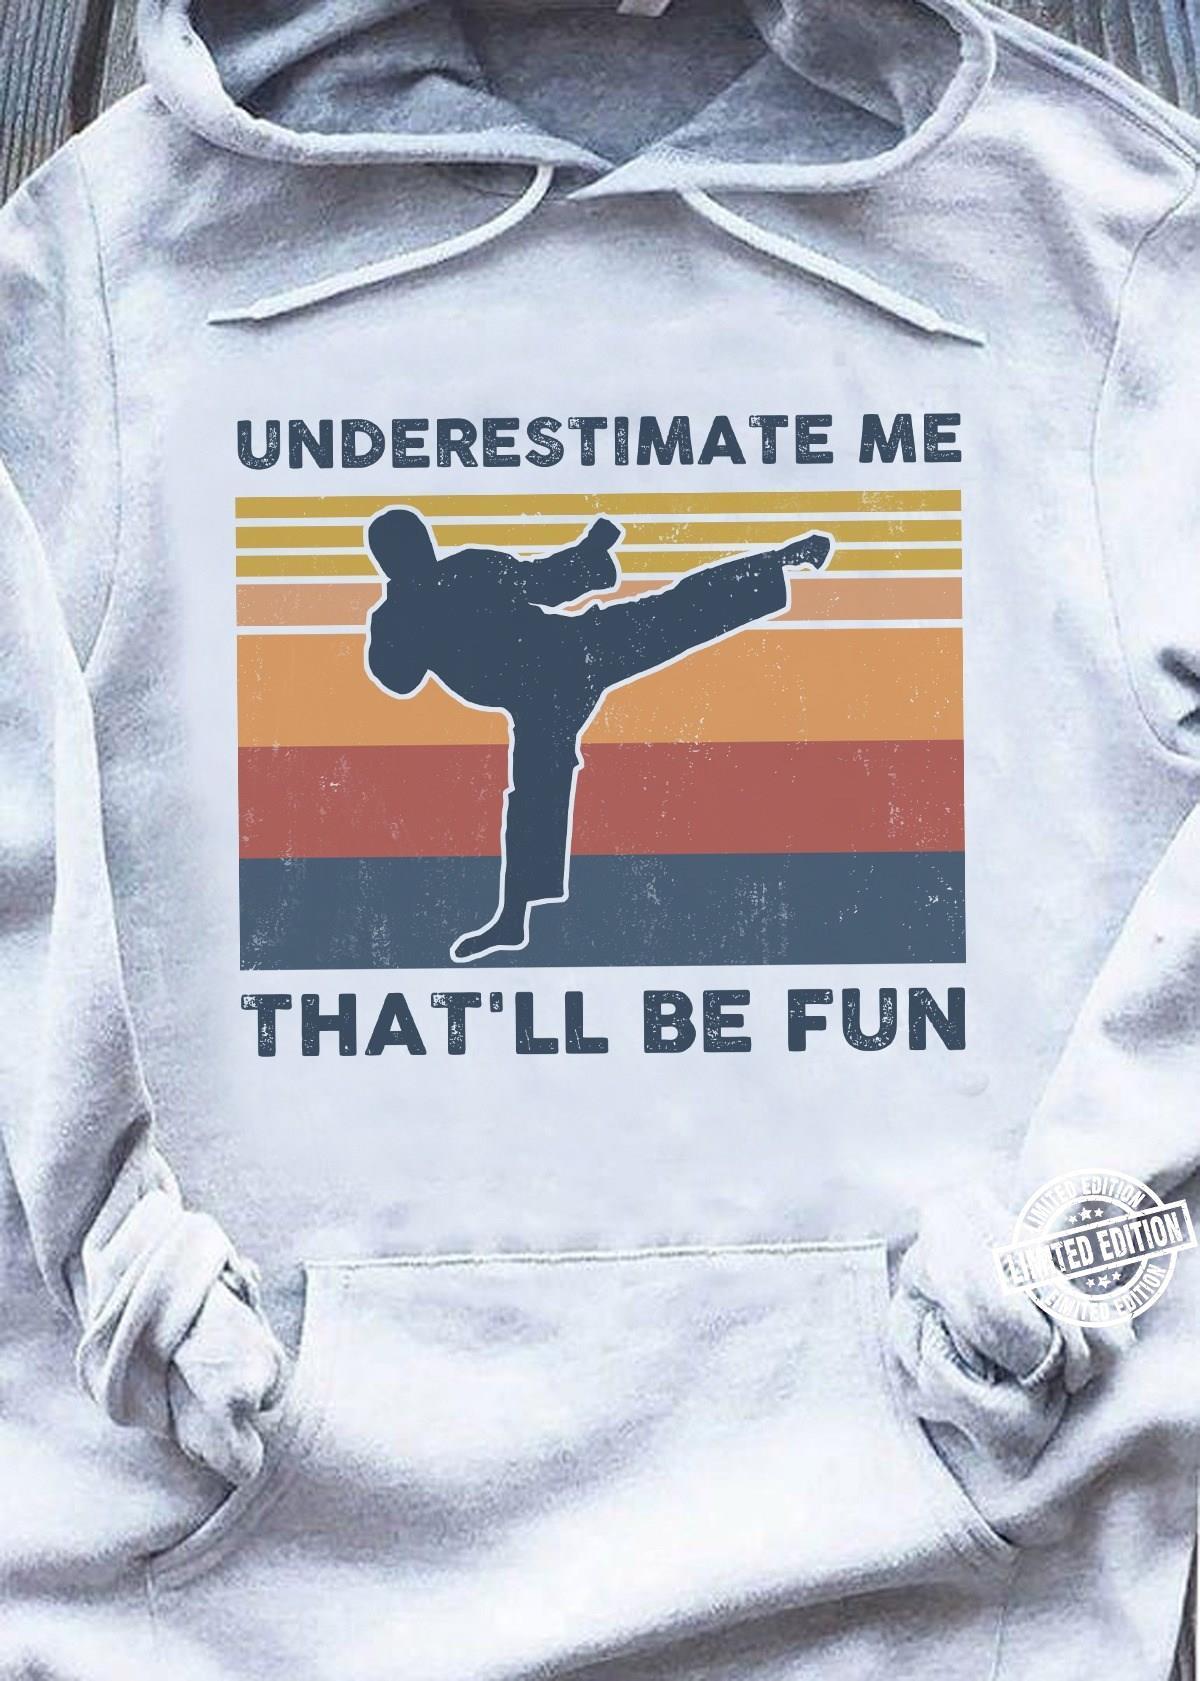 Underestimate me that'll be fun tshirt